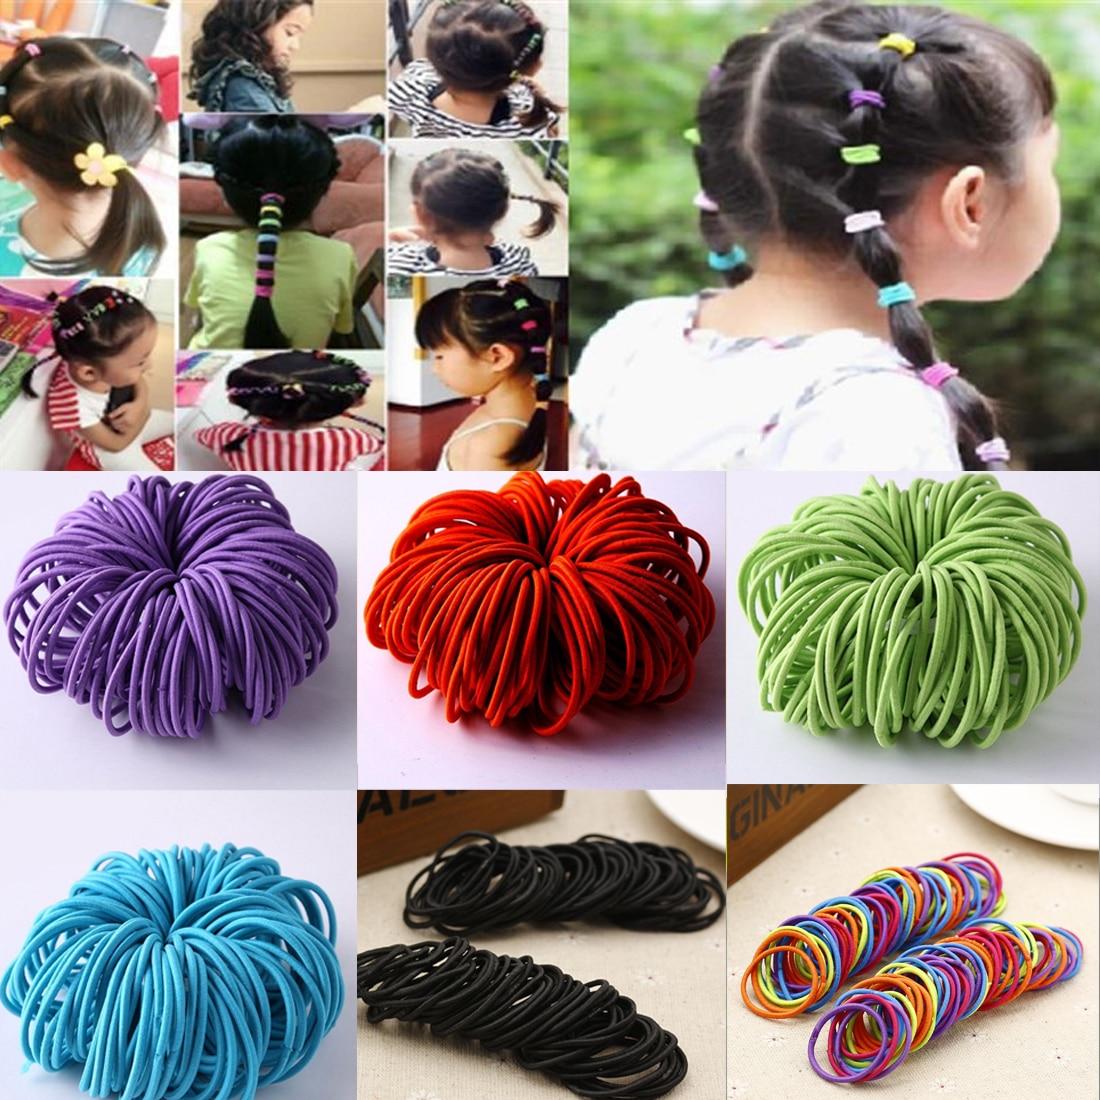 50Pcs/Set Elastic Hair Bands Black Hairbands for Girls Fashion Women Gum Accessories